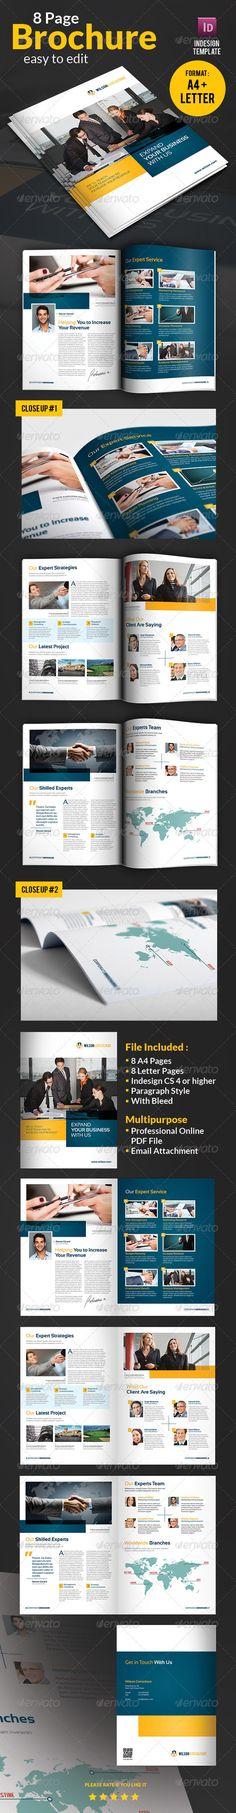 brochure examples for business - Nisatasj-plus